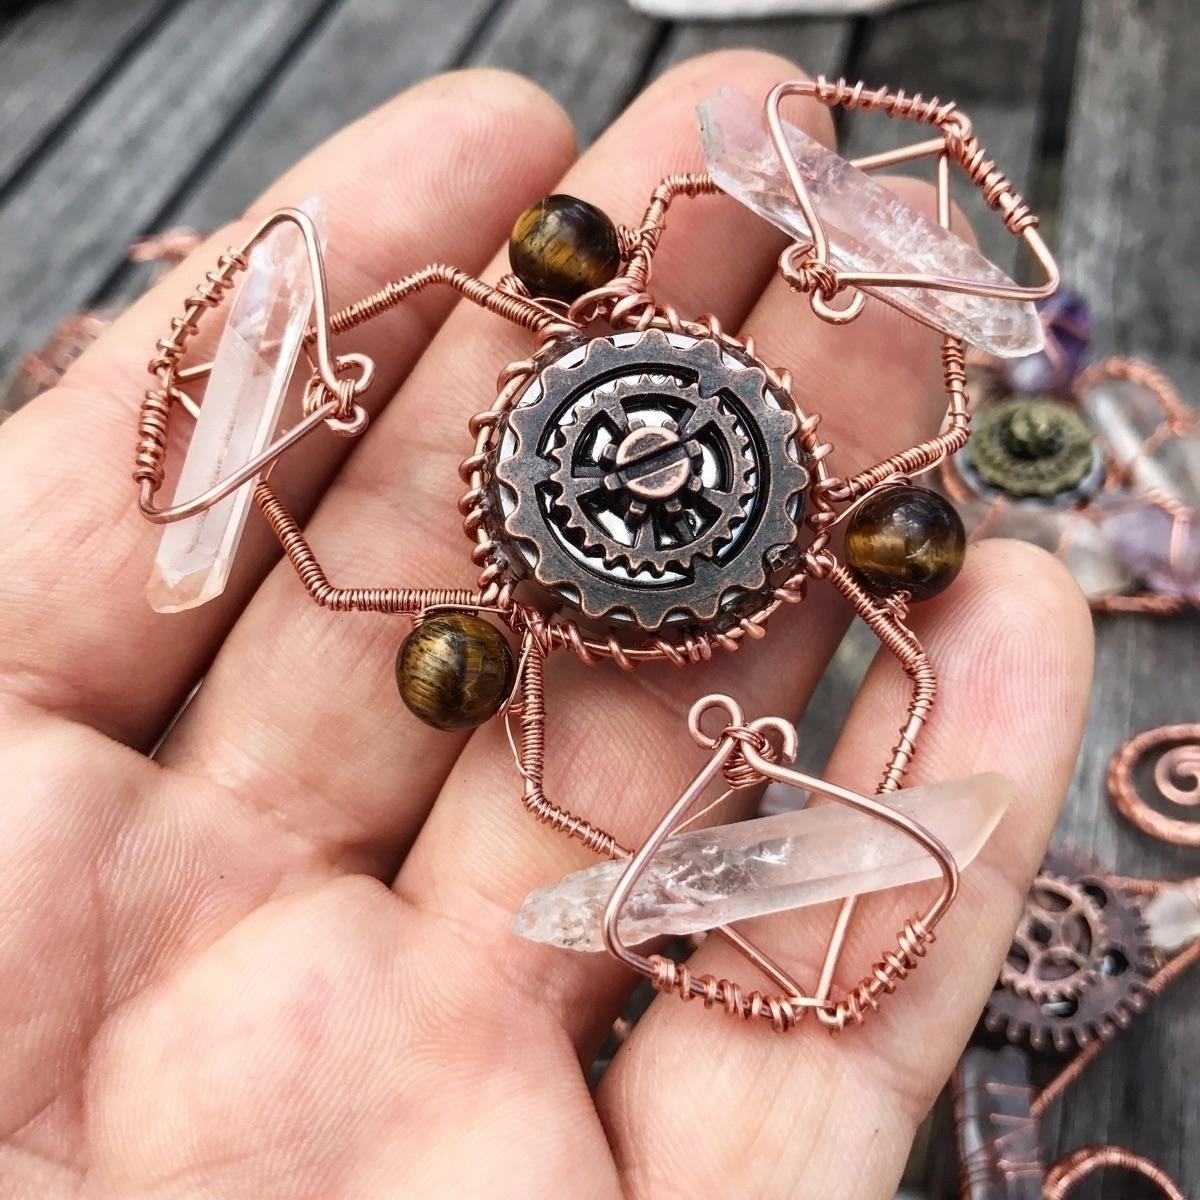 crystal fidget spinners stocked - twistedleafstudio   ello